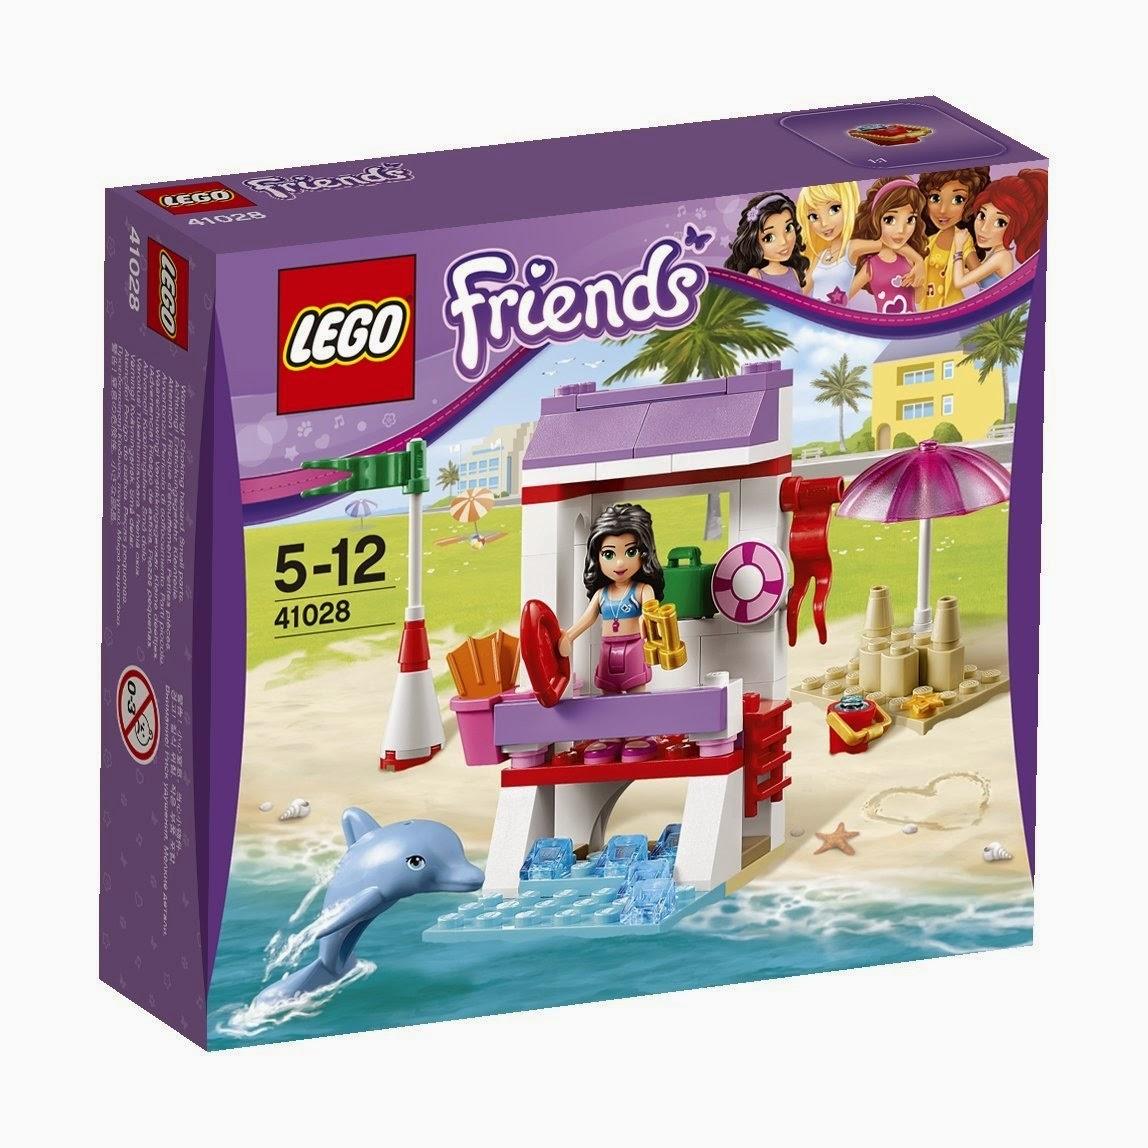 TOYS - LEGO Friends - 41028 El Puesto de Socorrista de Emma  Juguete Oficial | Emma's Lifeguard Post | A partir de 5 años